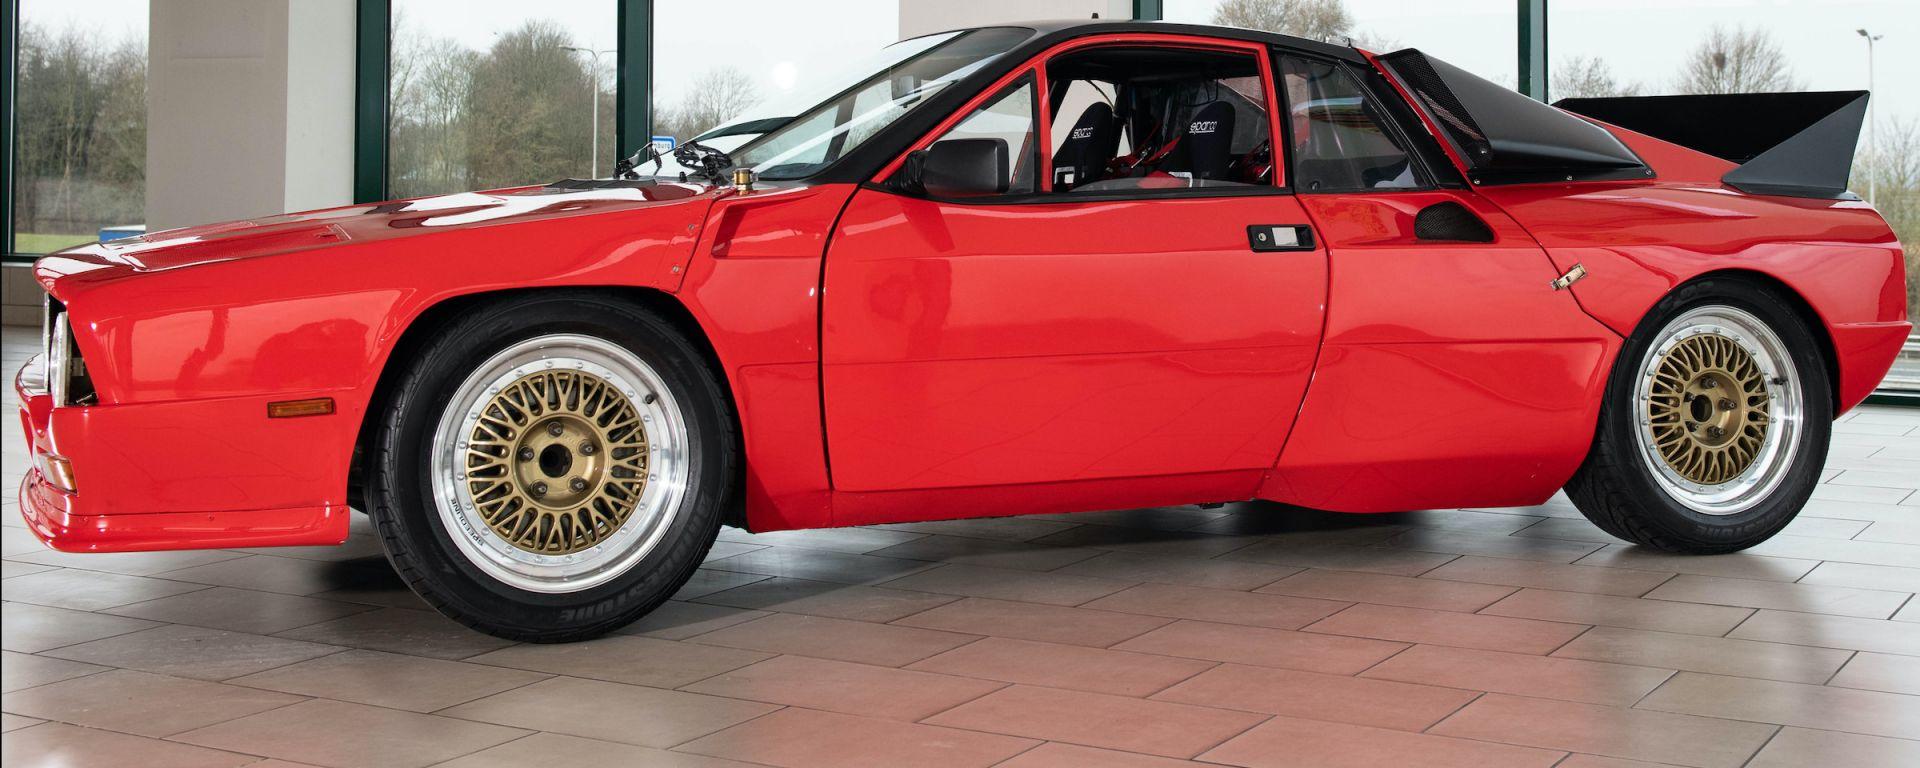 Lancia 037 Rally (1981)